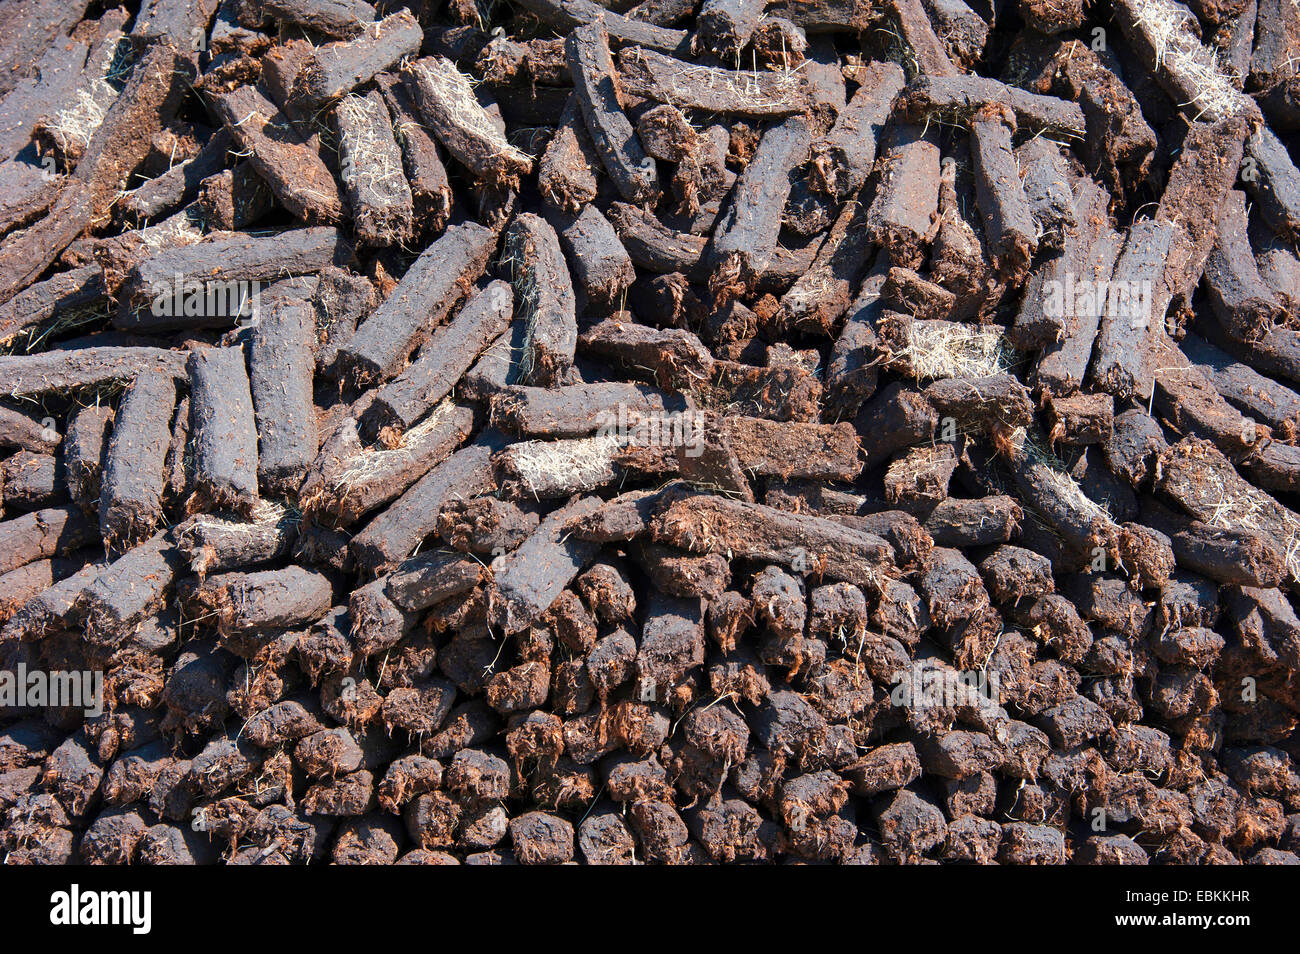 peat cutting, heap with sods of peat, Germany, Lower Saxony, Wilhelmsfehn Stock Photo